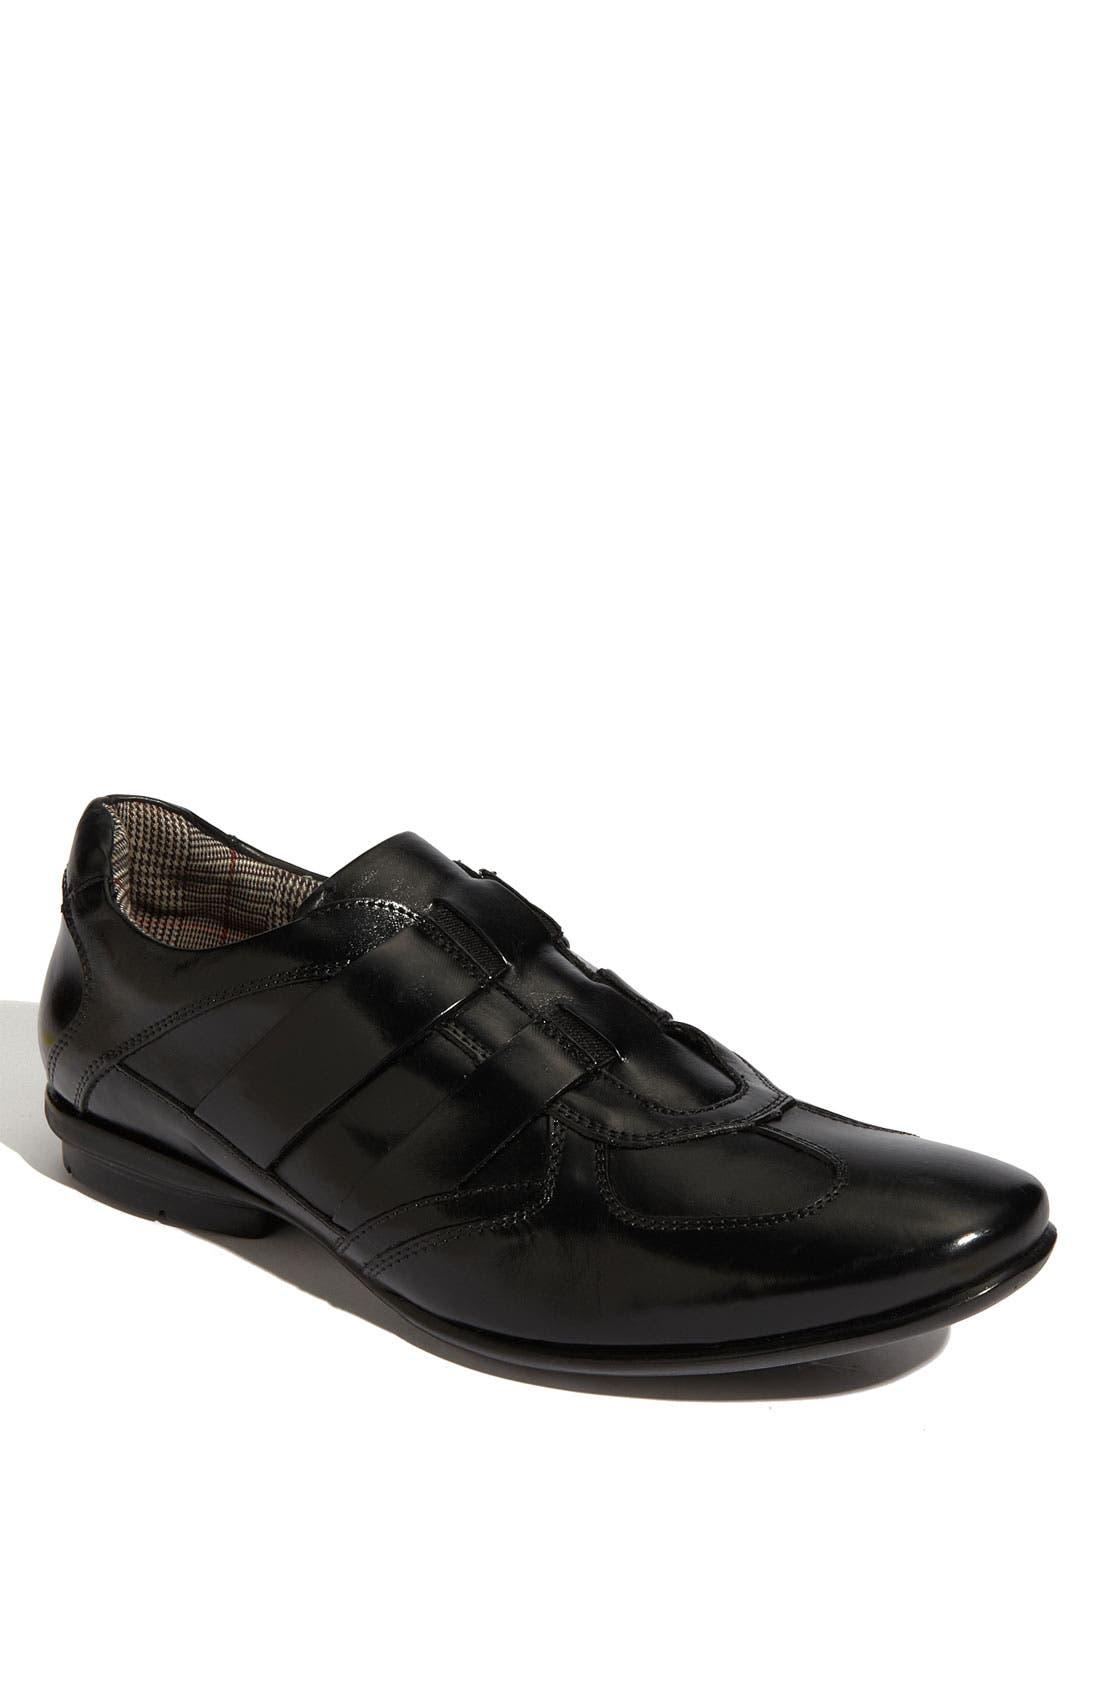 Alternate Image 1 Selected - Bacco Bucci 'Fausto' Sneaker